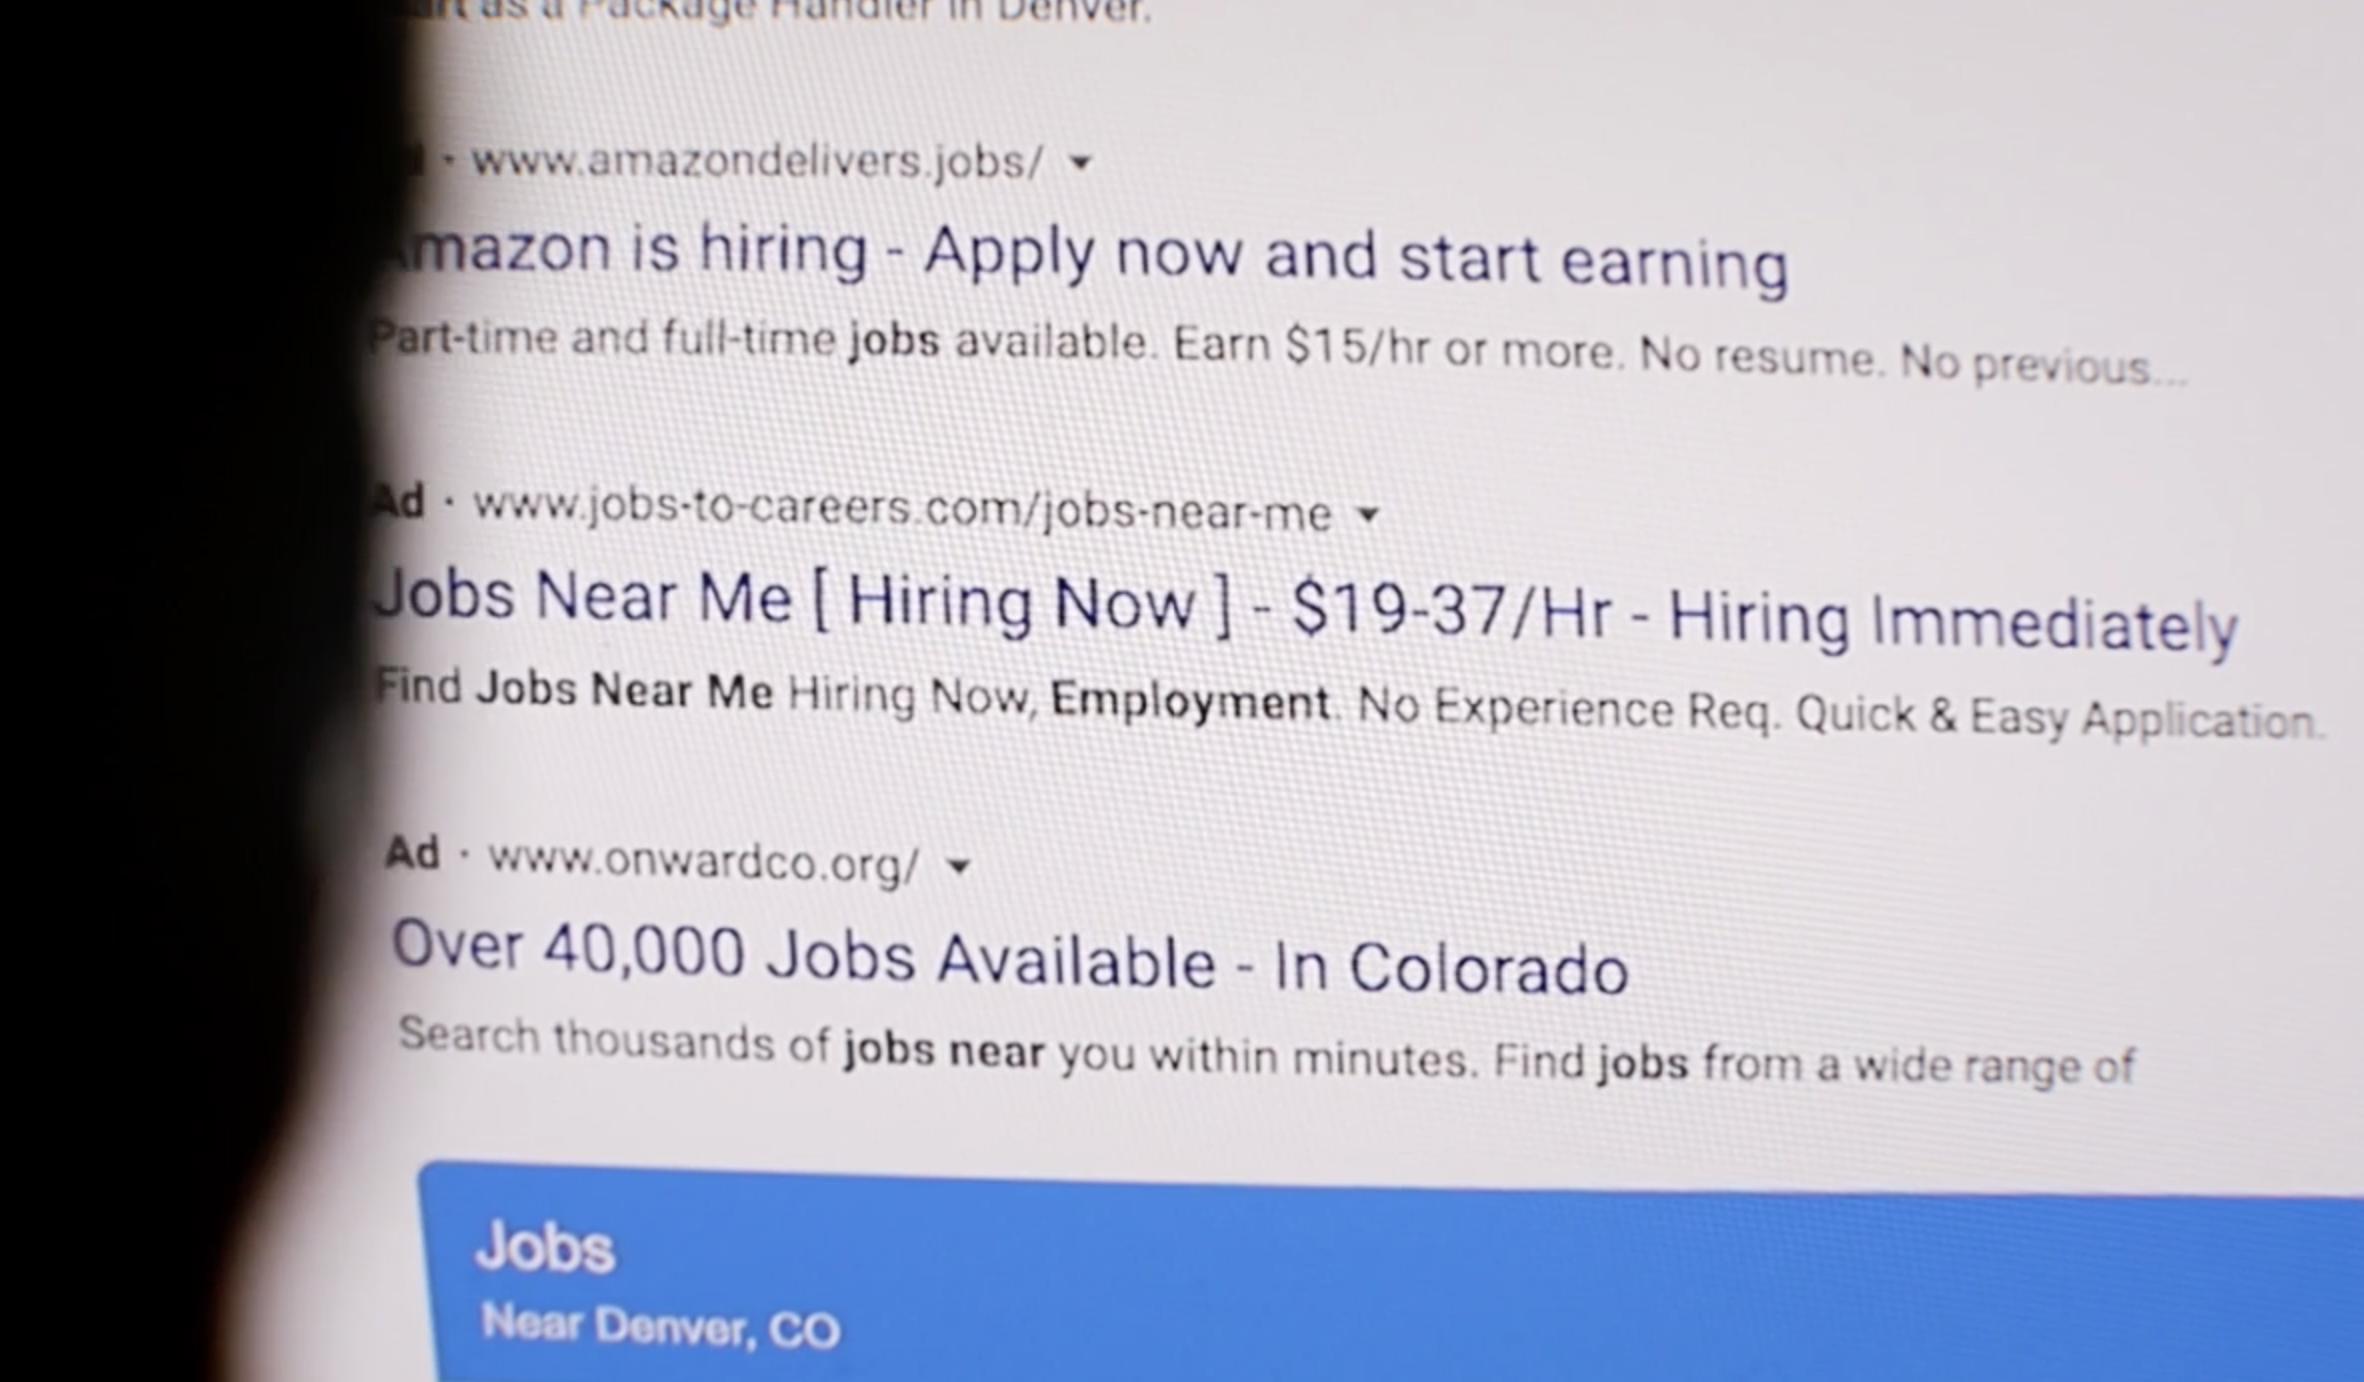 Jobs Hiring Now No Experience Near Me